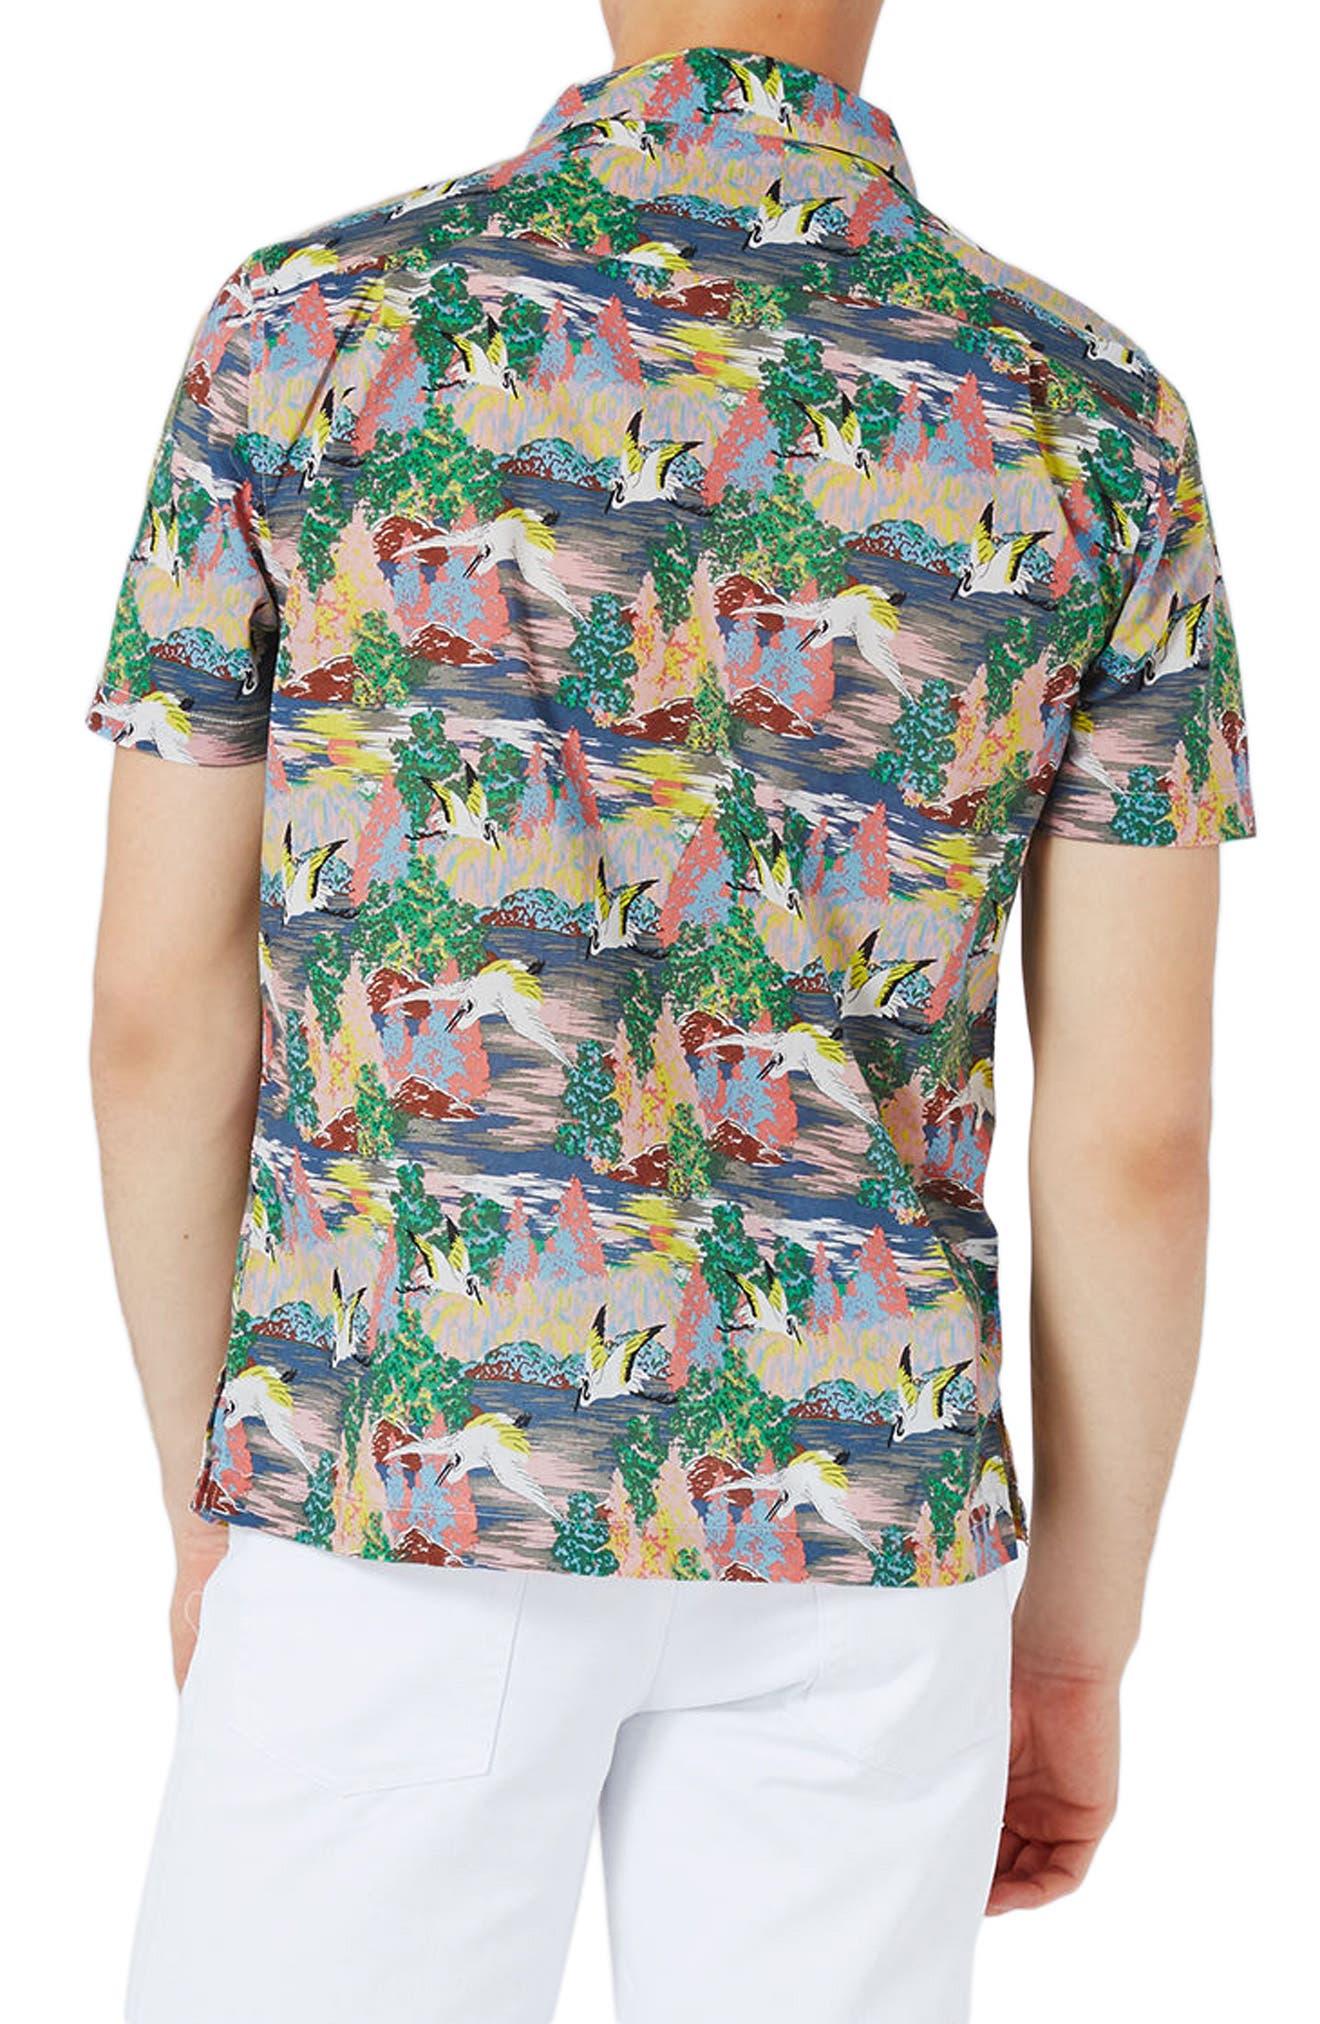 Heron Print Shirt,                             Alternate thumbnail 2, color,                             400